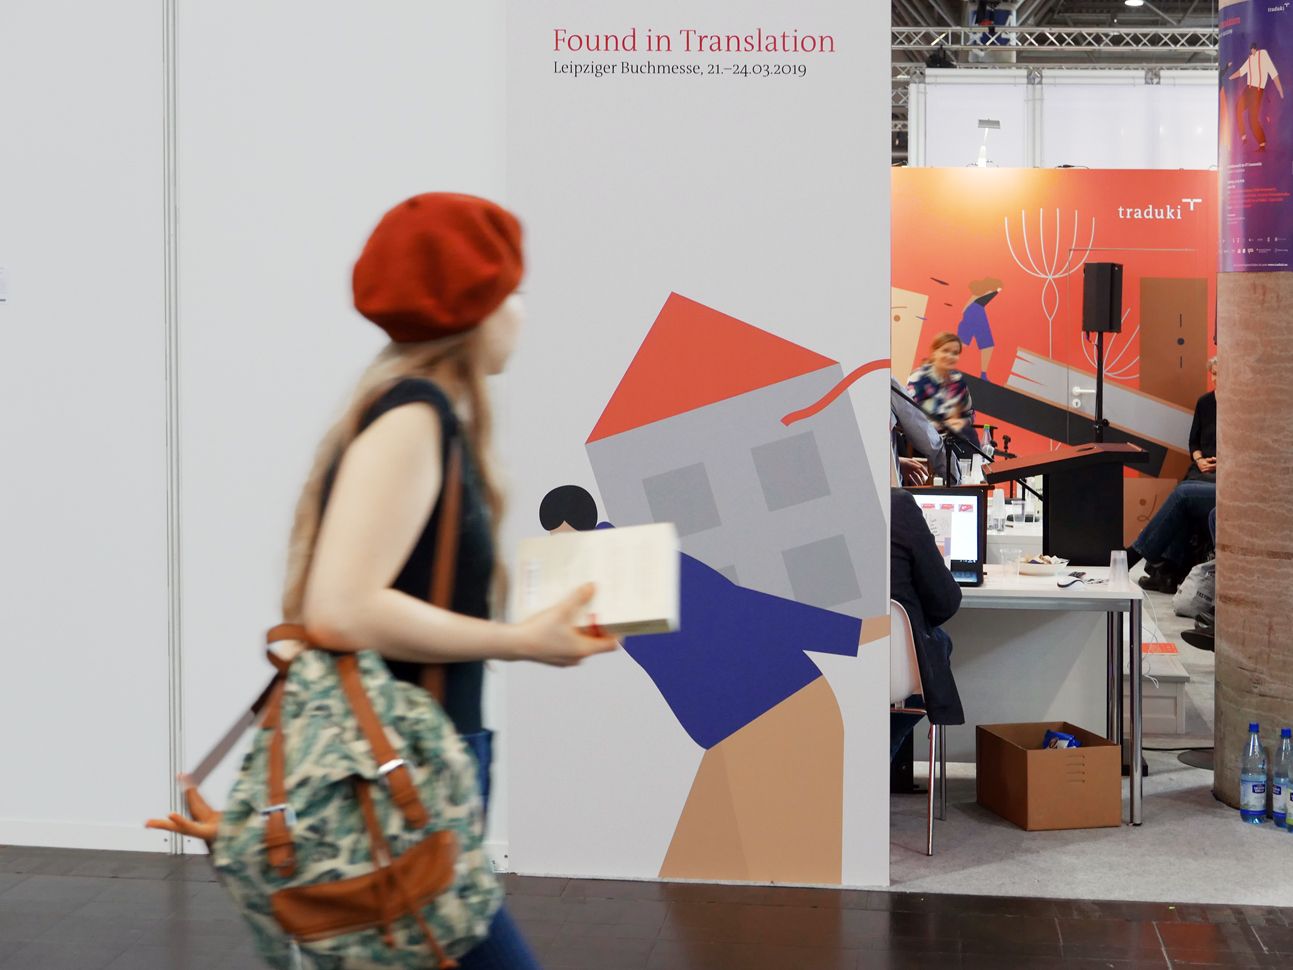 martin zech design, projekt design, traduki, messestand, leipziger buchmesse, 2019, seitenansicht